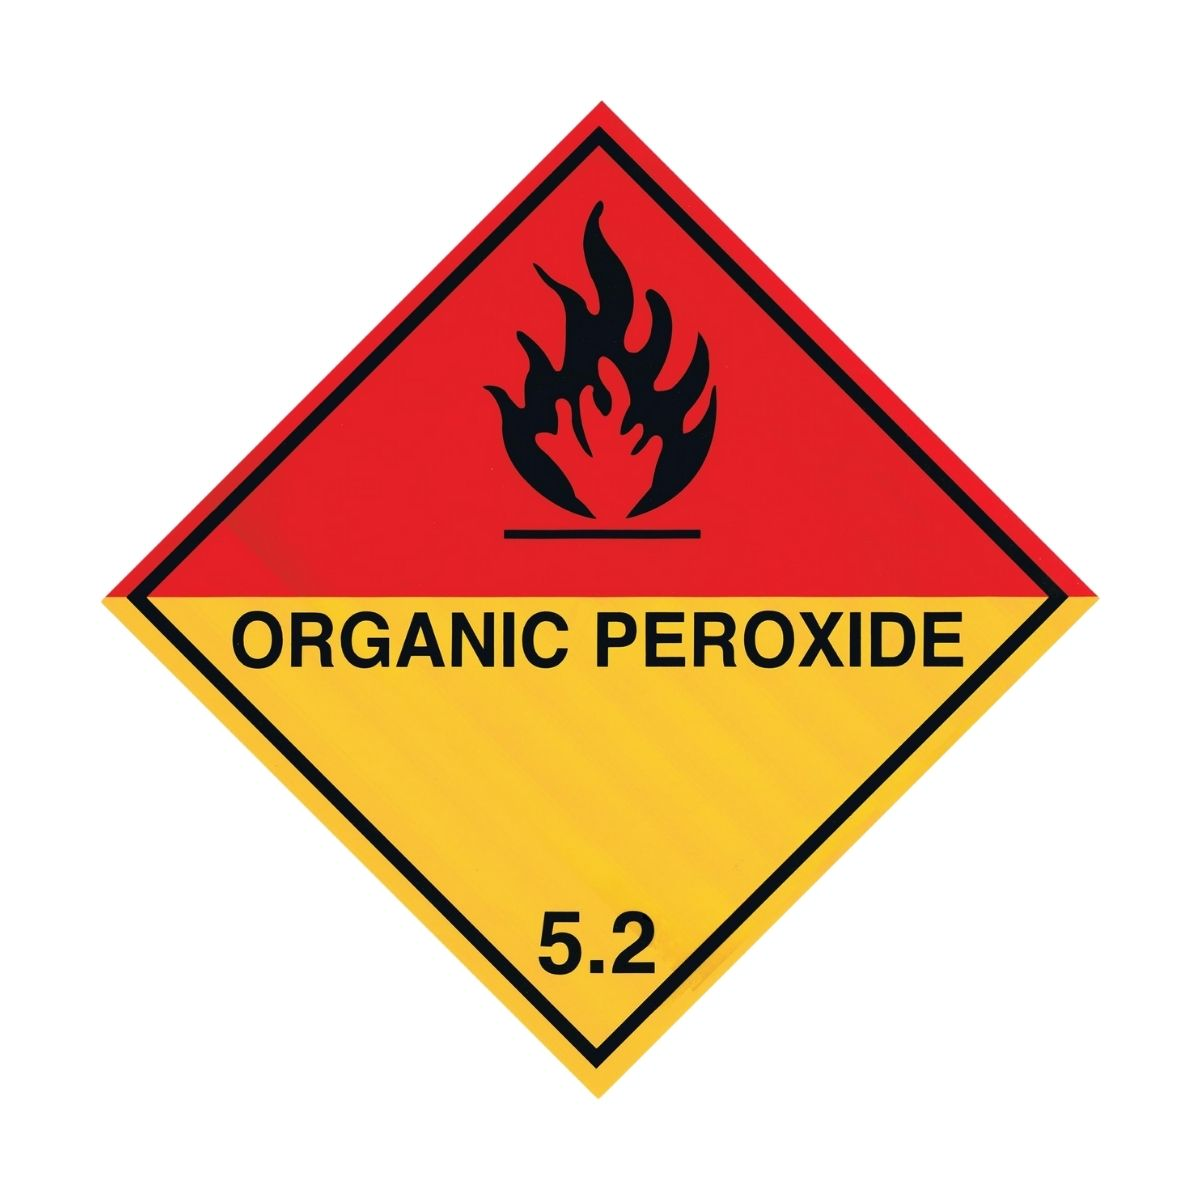 HD1511 UN Hazard Warning Diamond Class 5.2 Organic Peroxide